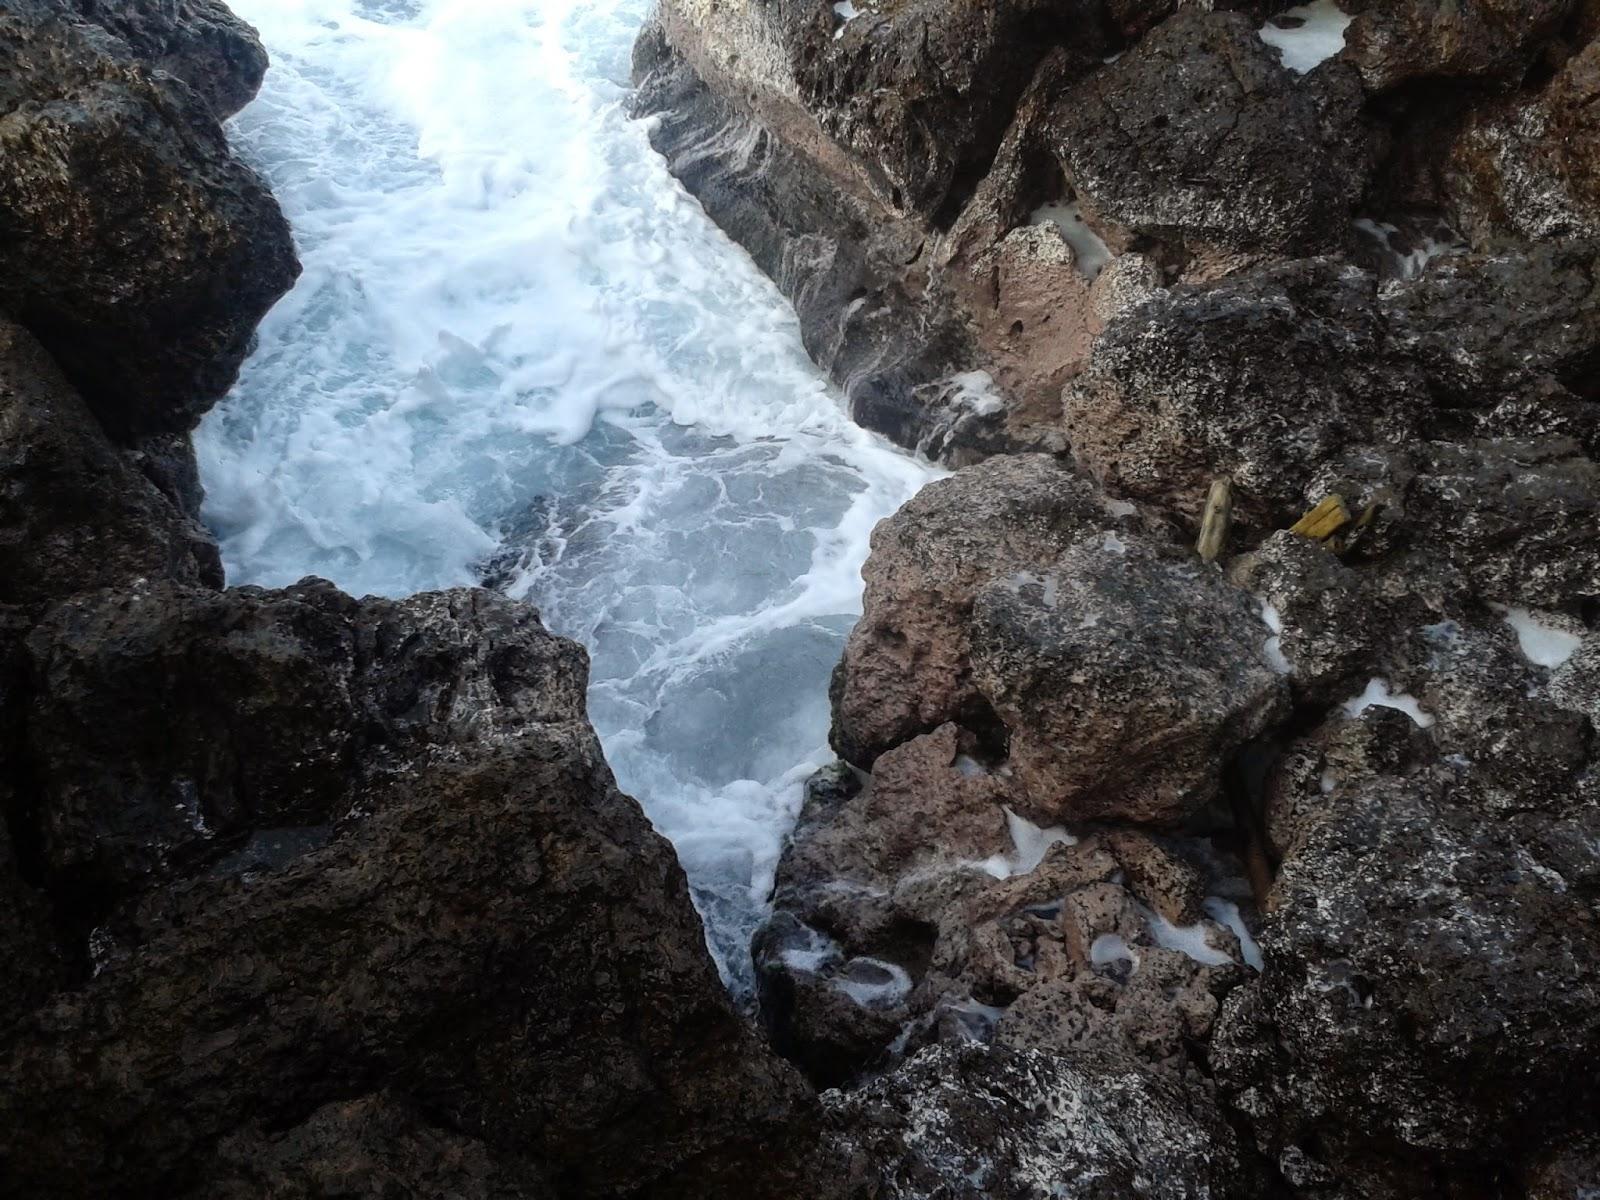 Goa Jepang, Ujung Batulawang, Karimunjawa